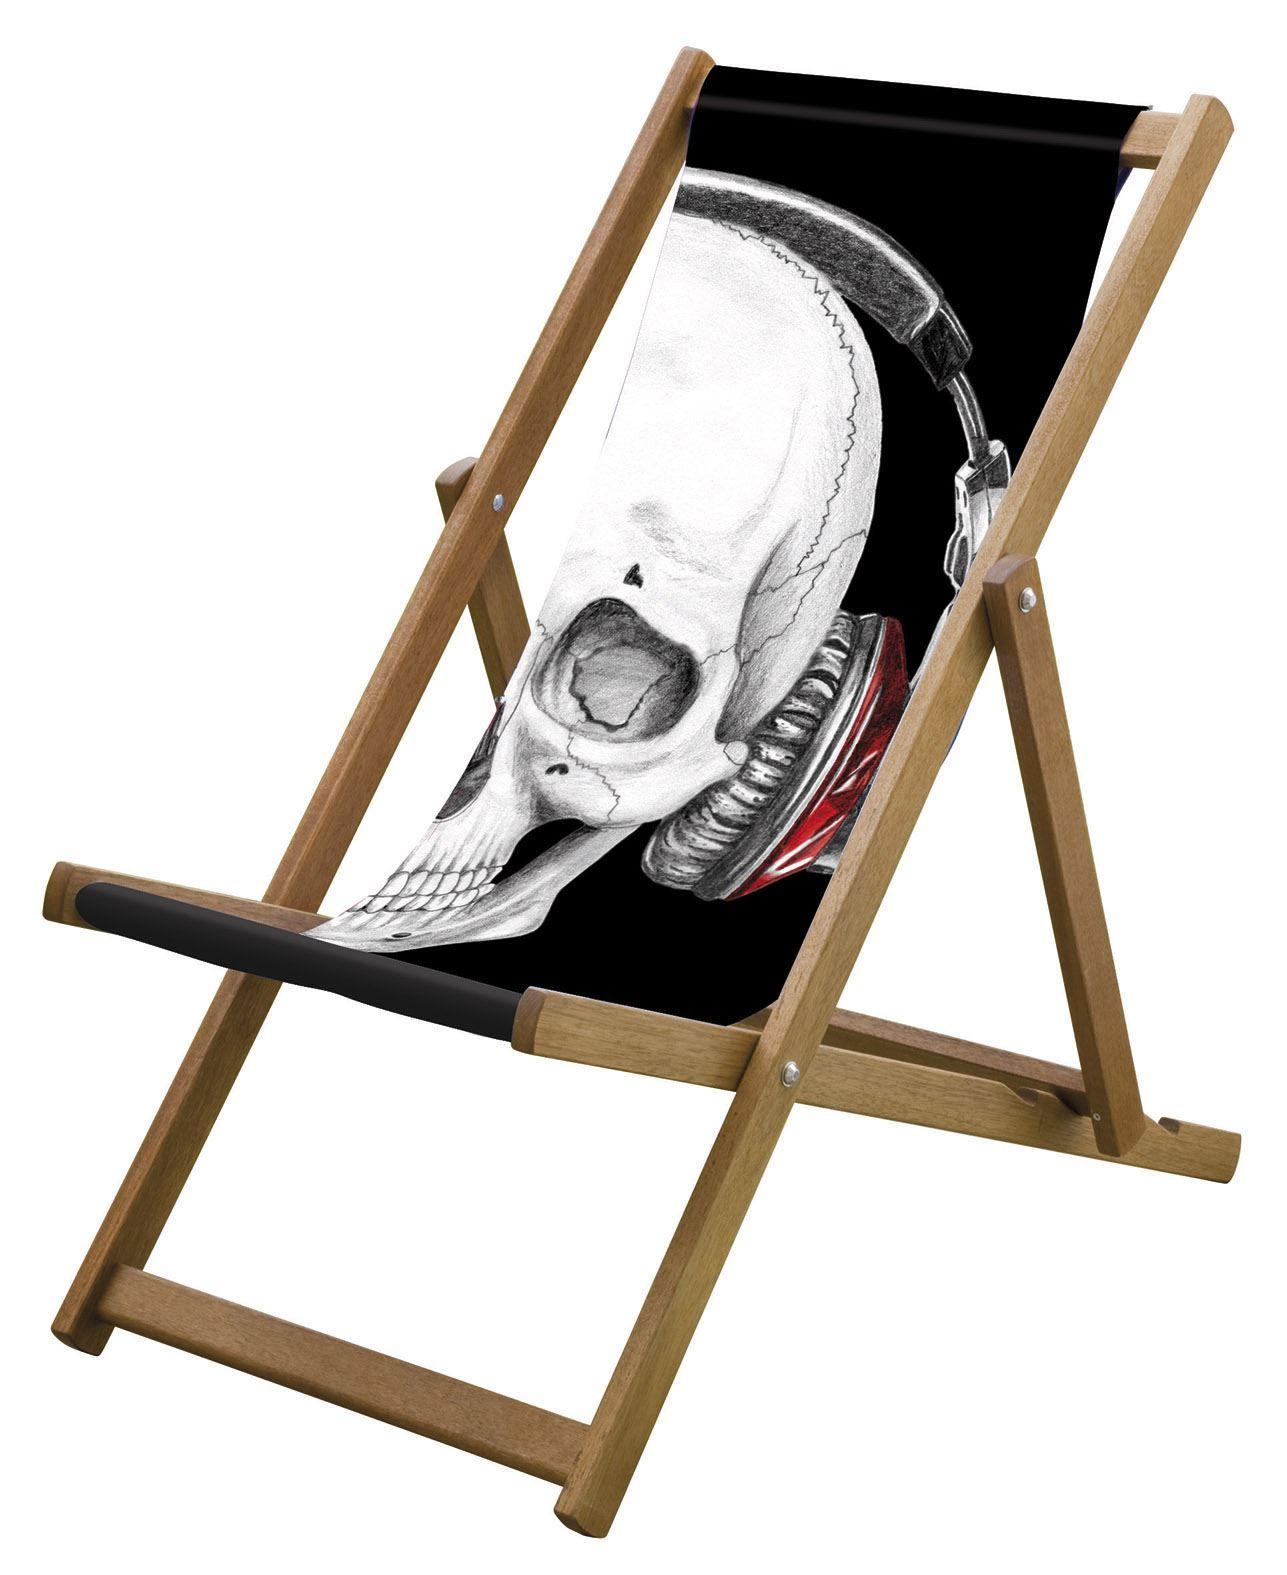 black skull chair small leather club lazy days deck bone phones summer garden